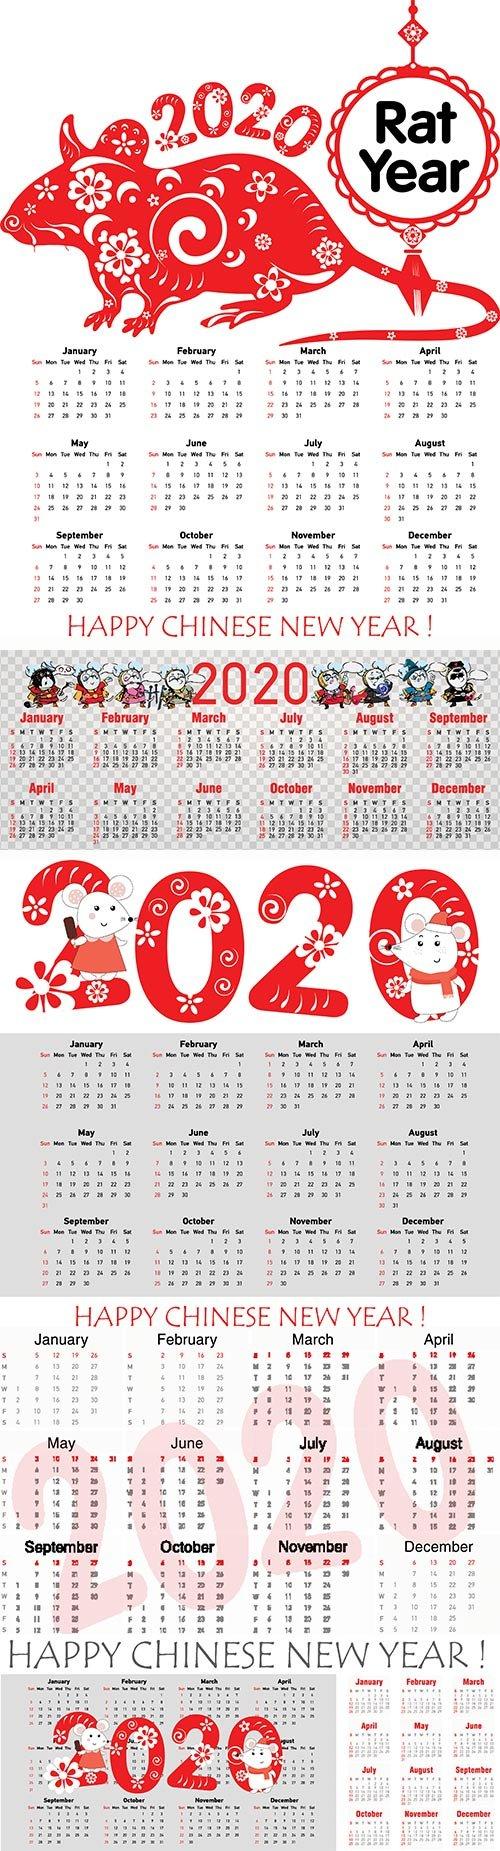 Rat year 2020 vector calendar